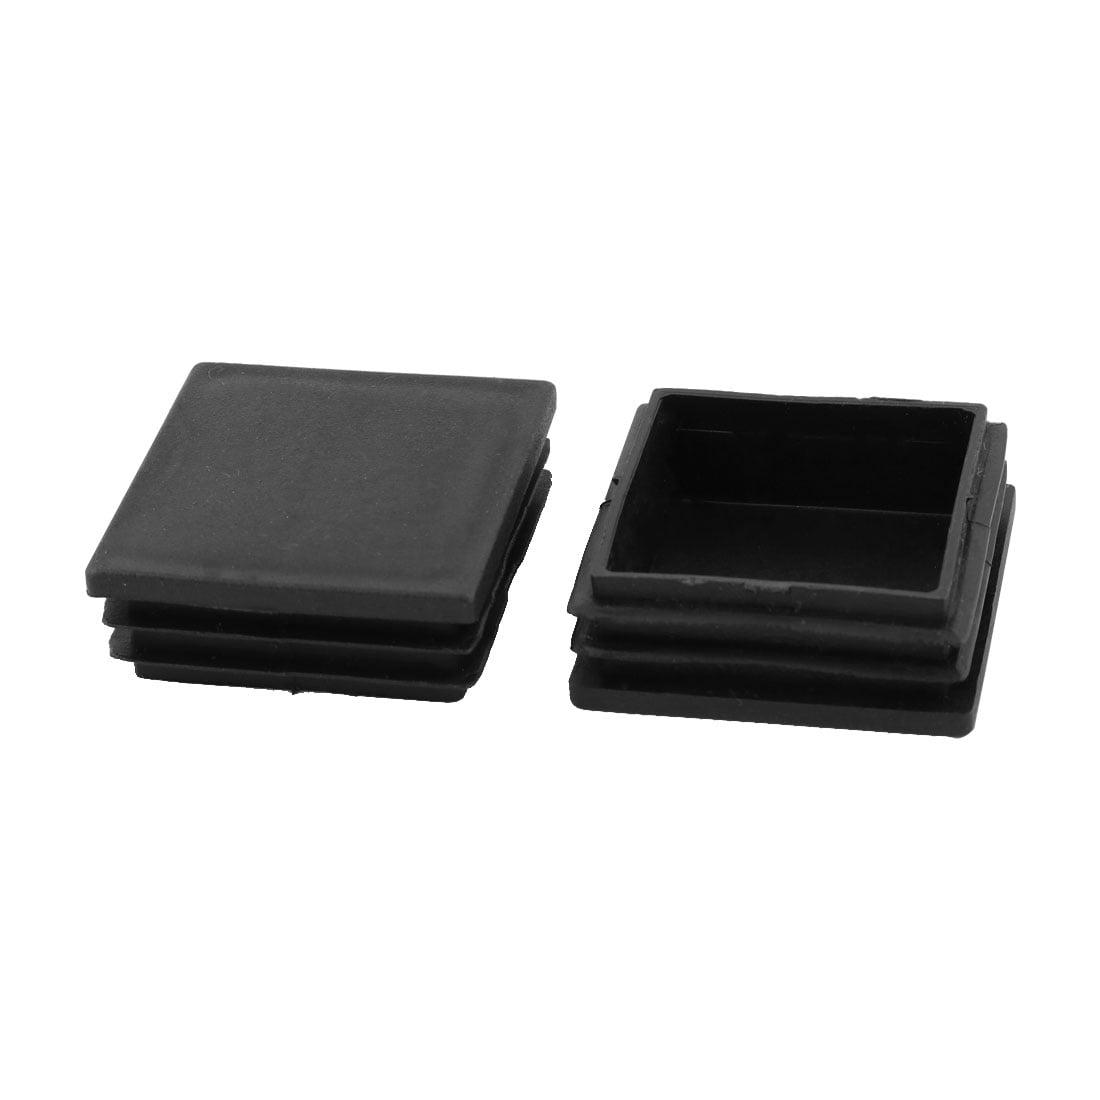 Home Furniture Plastic Square Shaped Feet Protector Tube Insert Black 30pcs - image 1 of 2